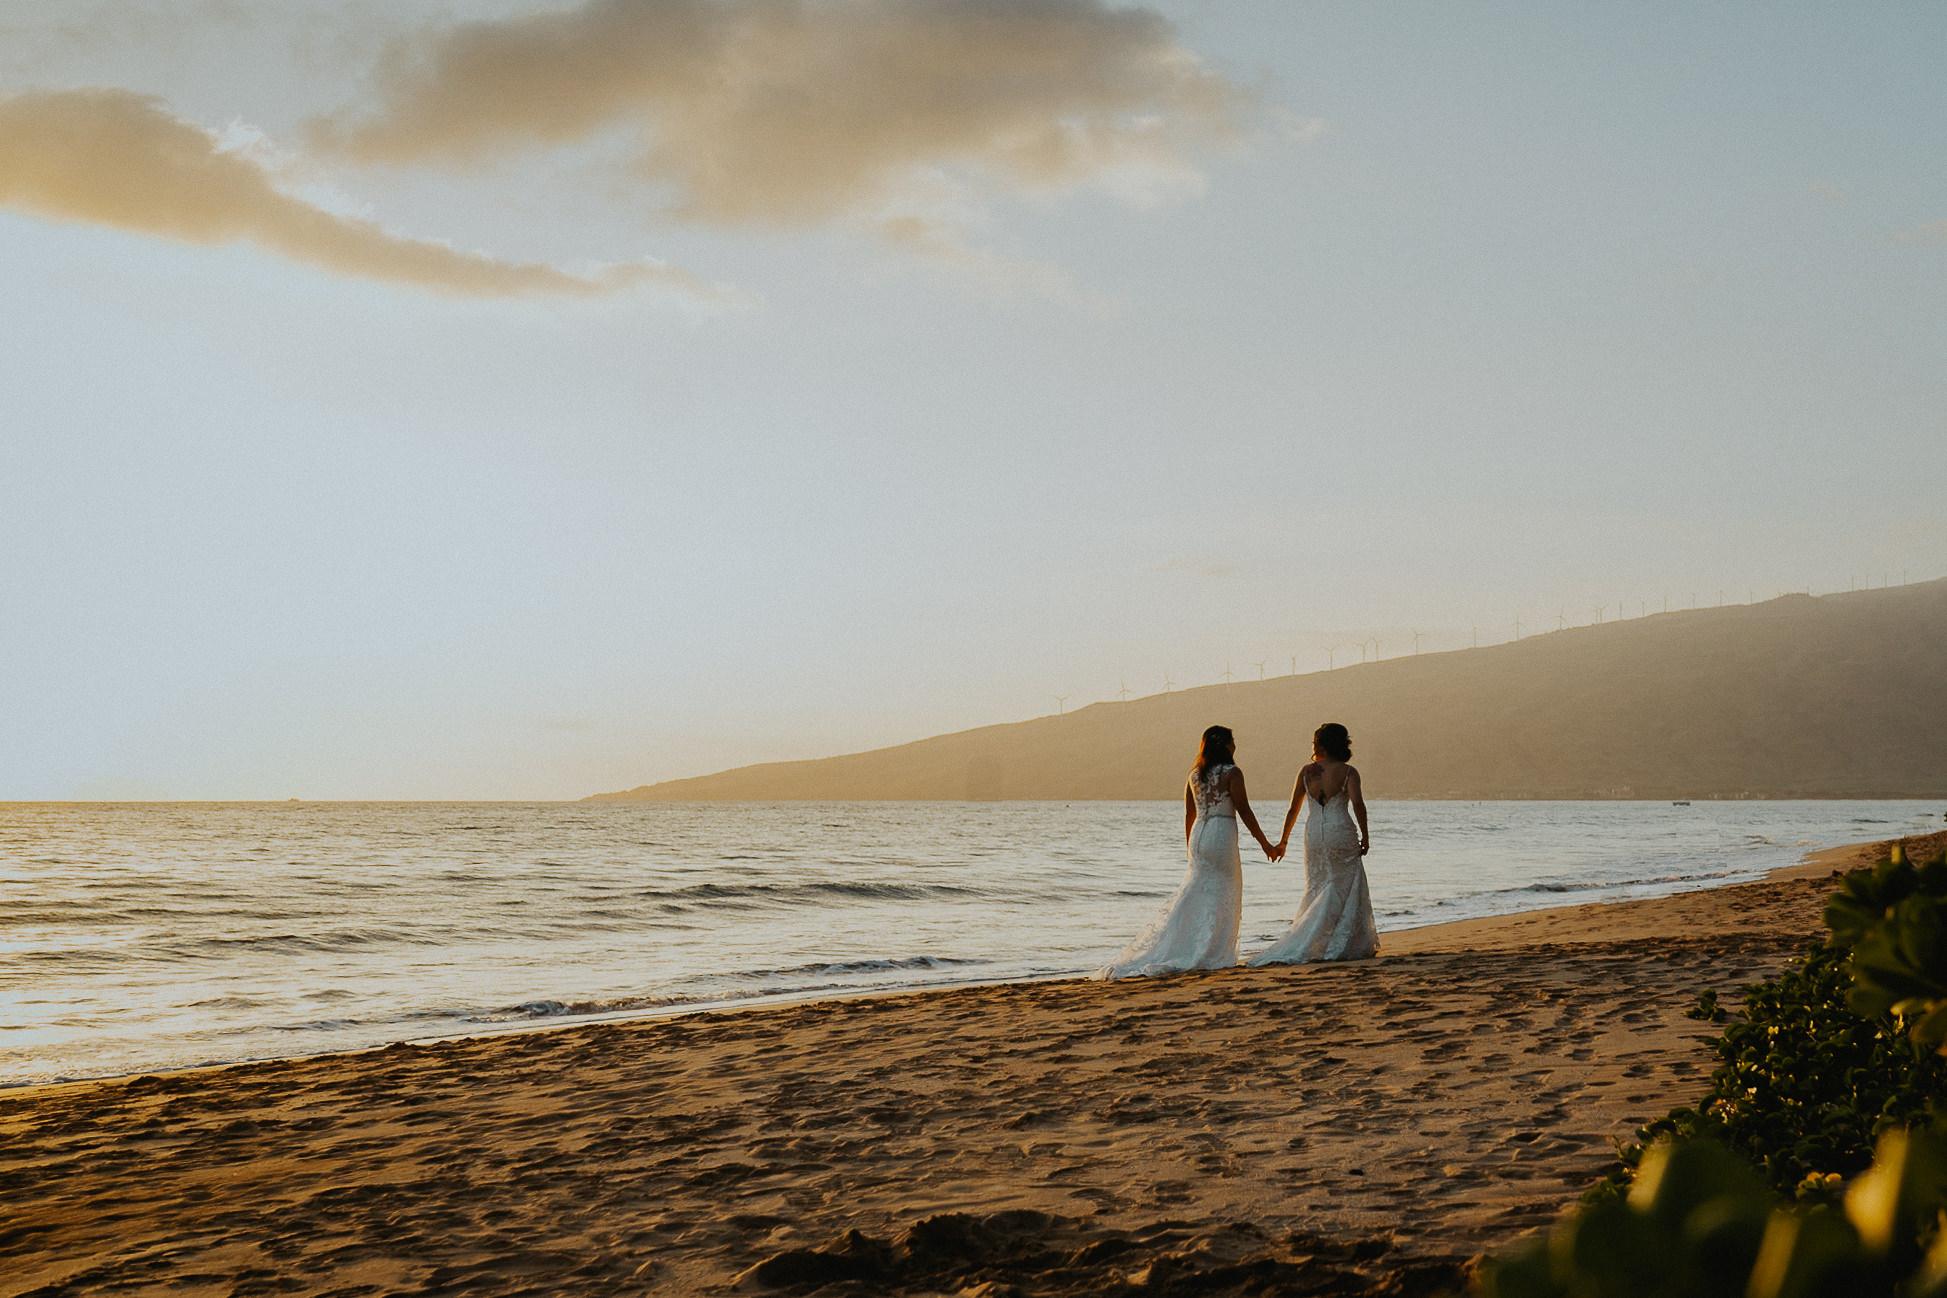 Maui_Destination_wedding_Alfred_Tang-48.jpg